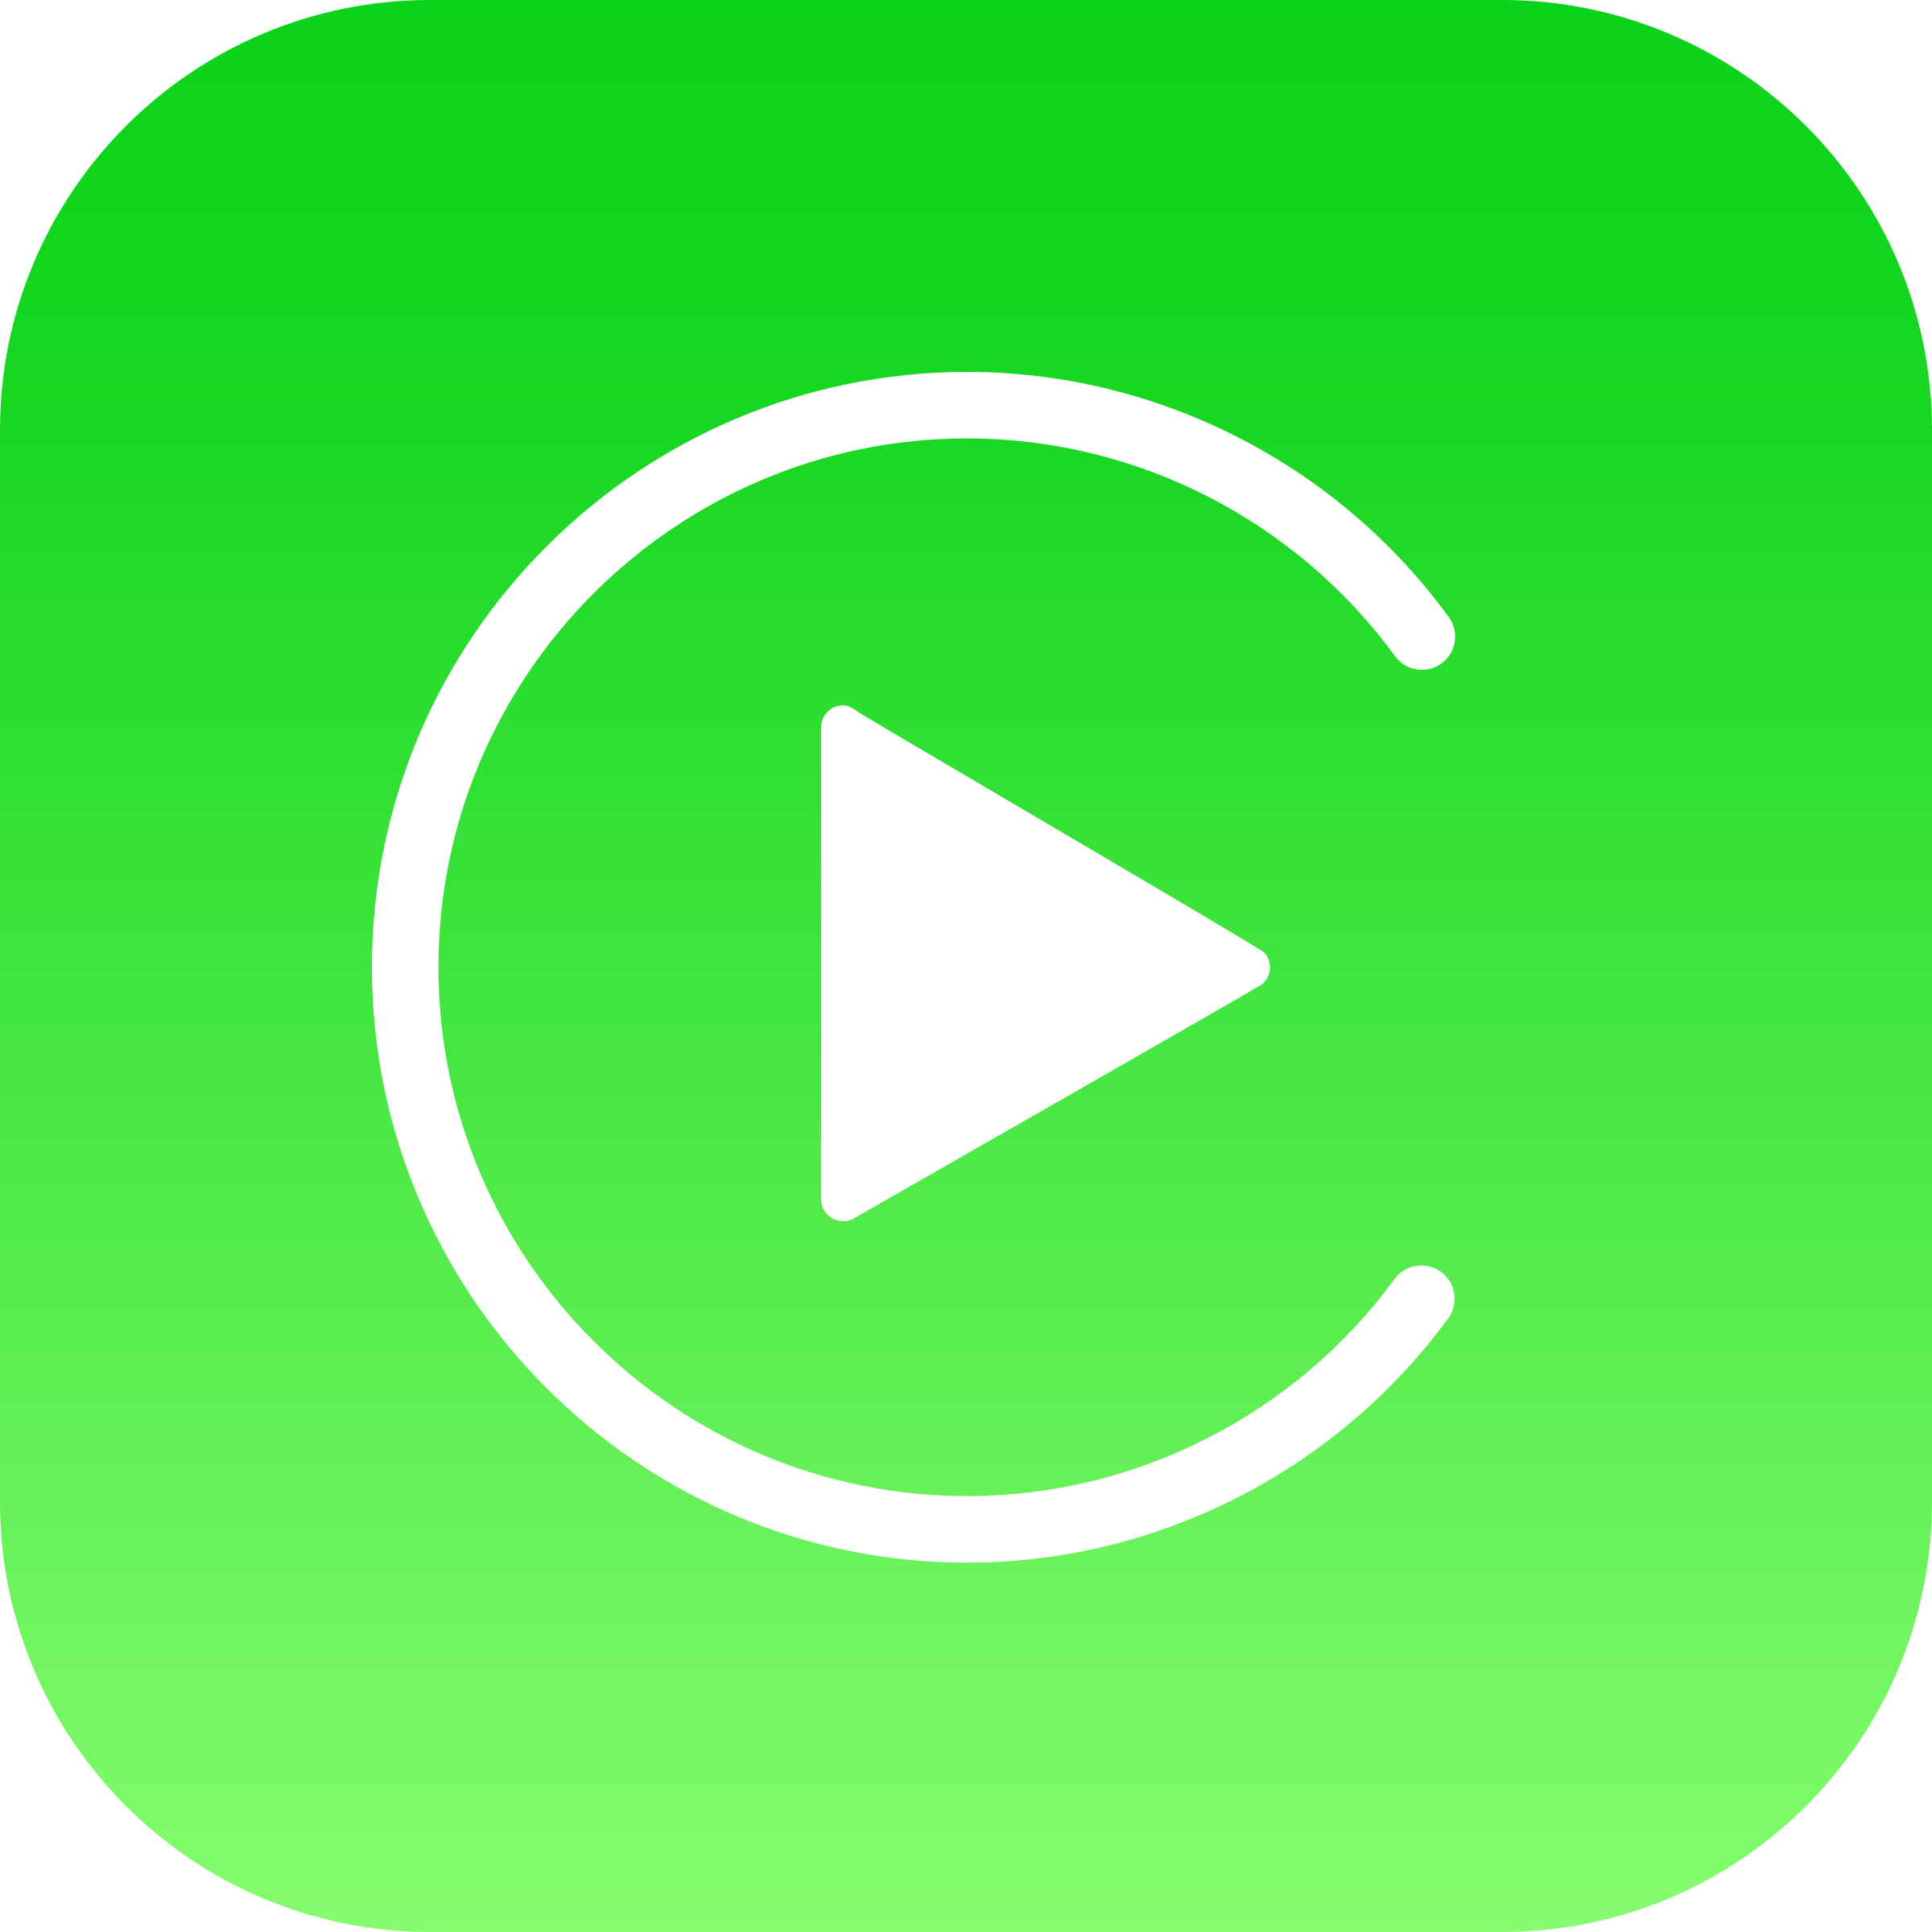 apple carplay icon logo png transparent amp svg vector